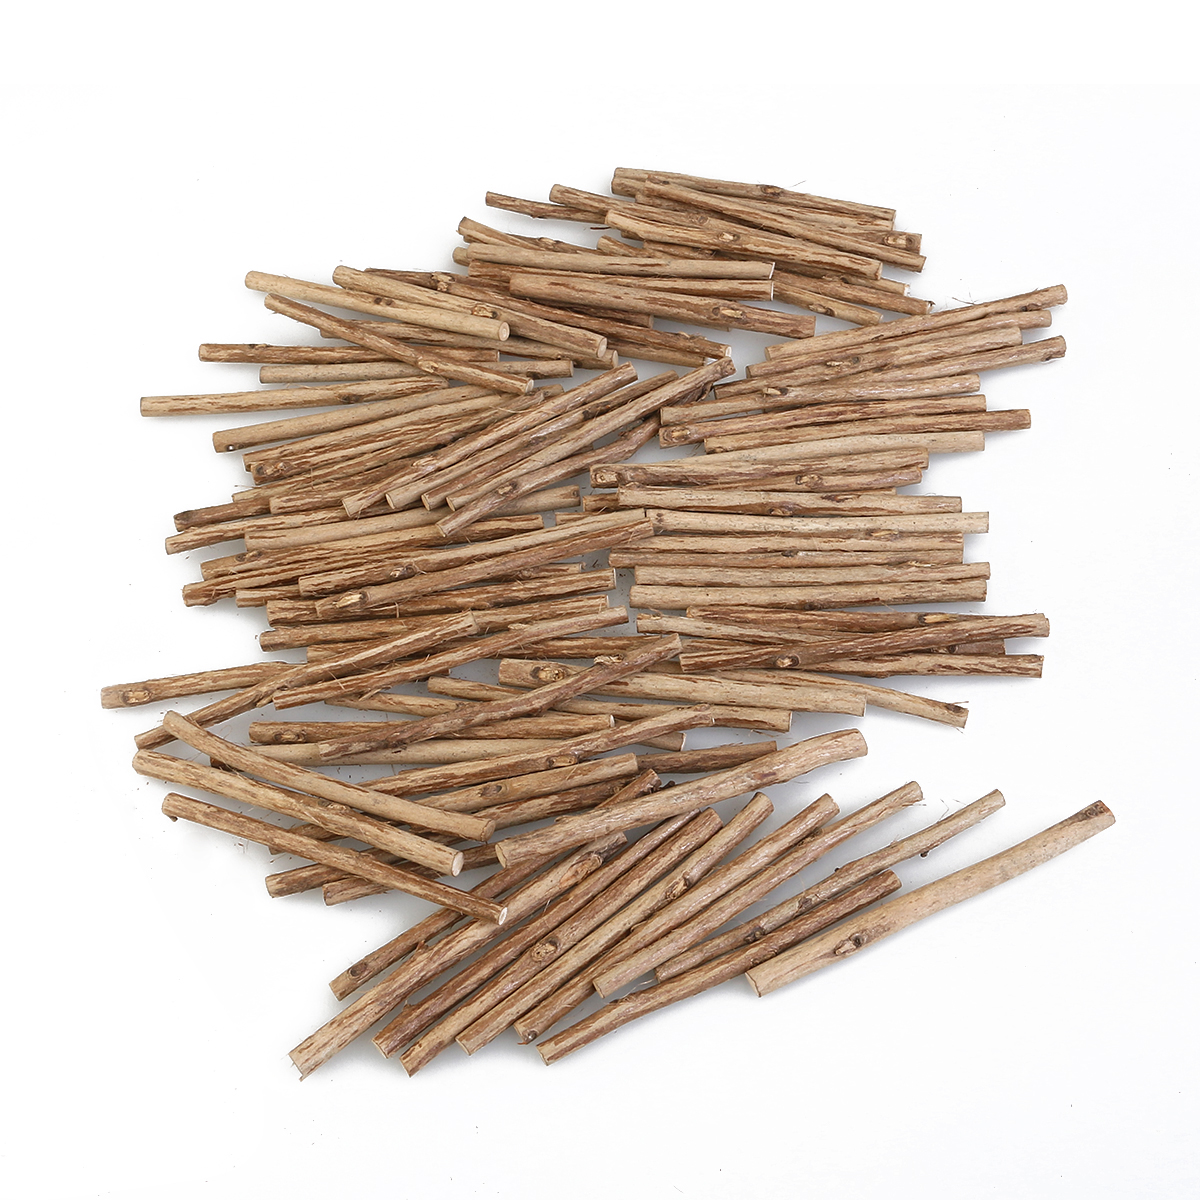 Long wooden craft sticks - 100pcs 10cm Long 0 5 0 8cm In Diameter Wood Log Sticks Diy Food Wood Crafts